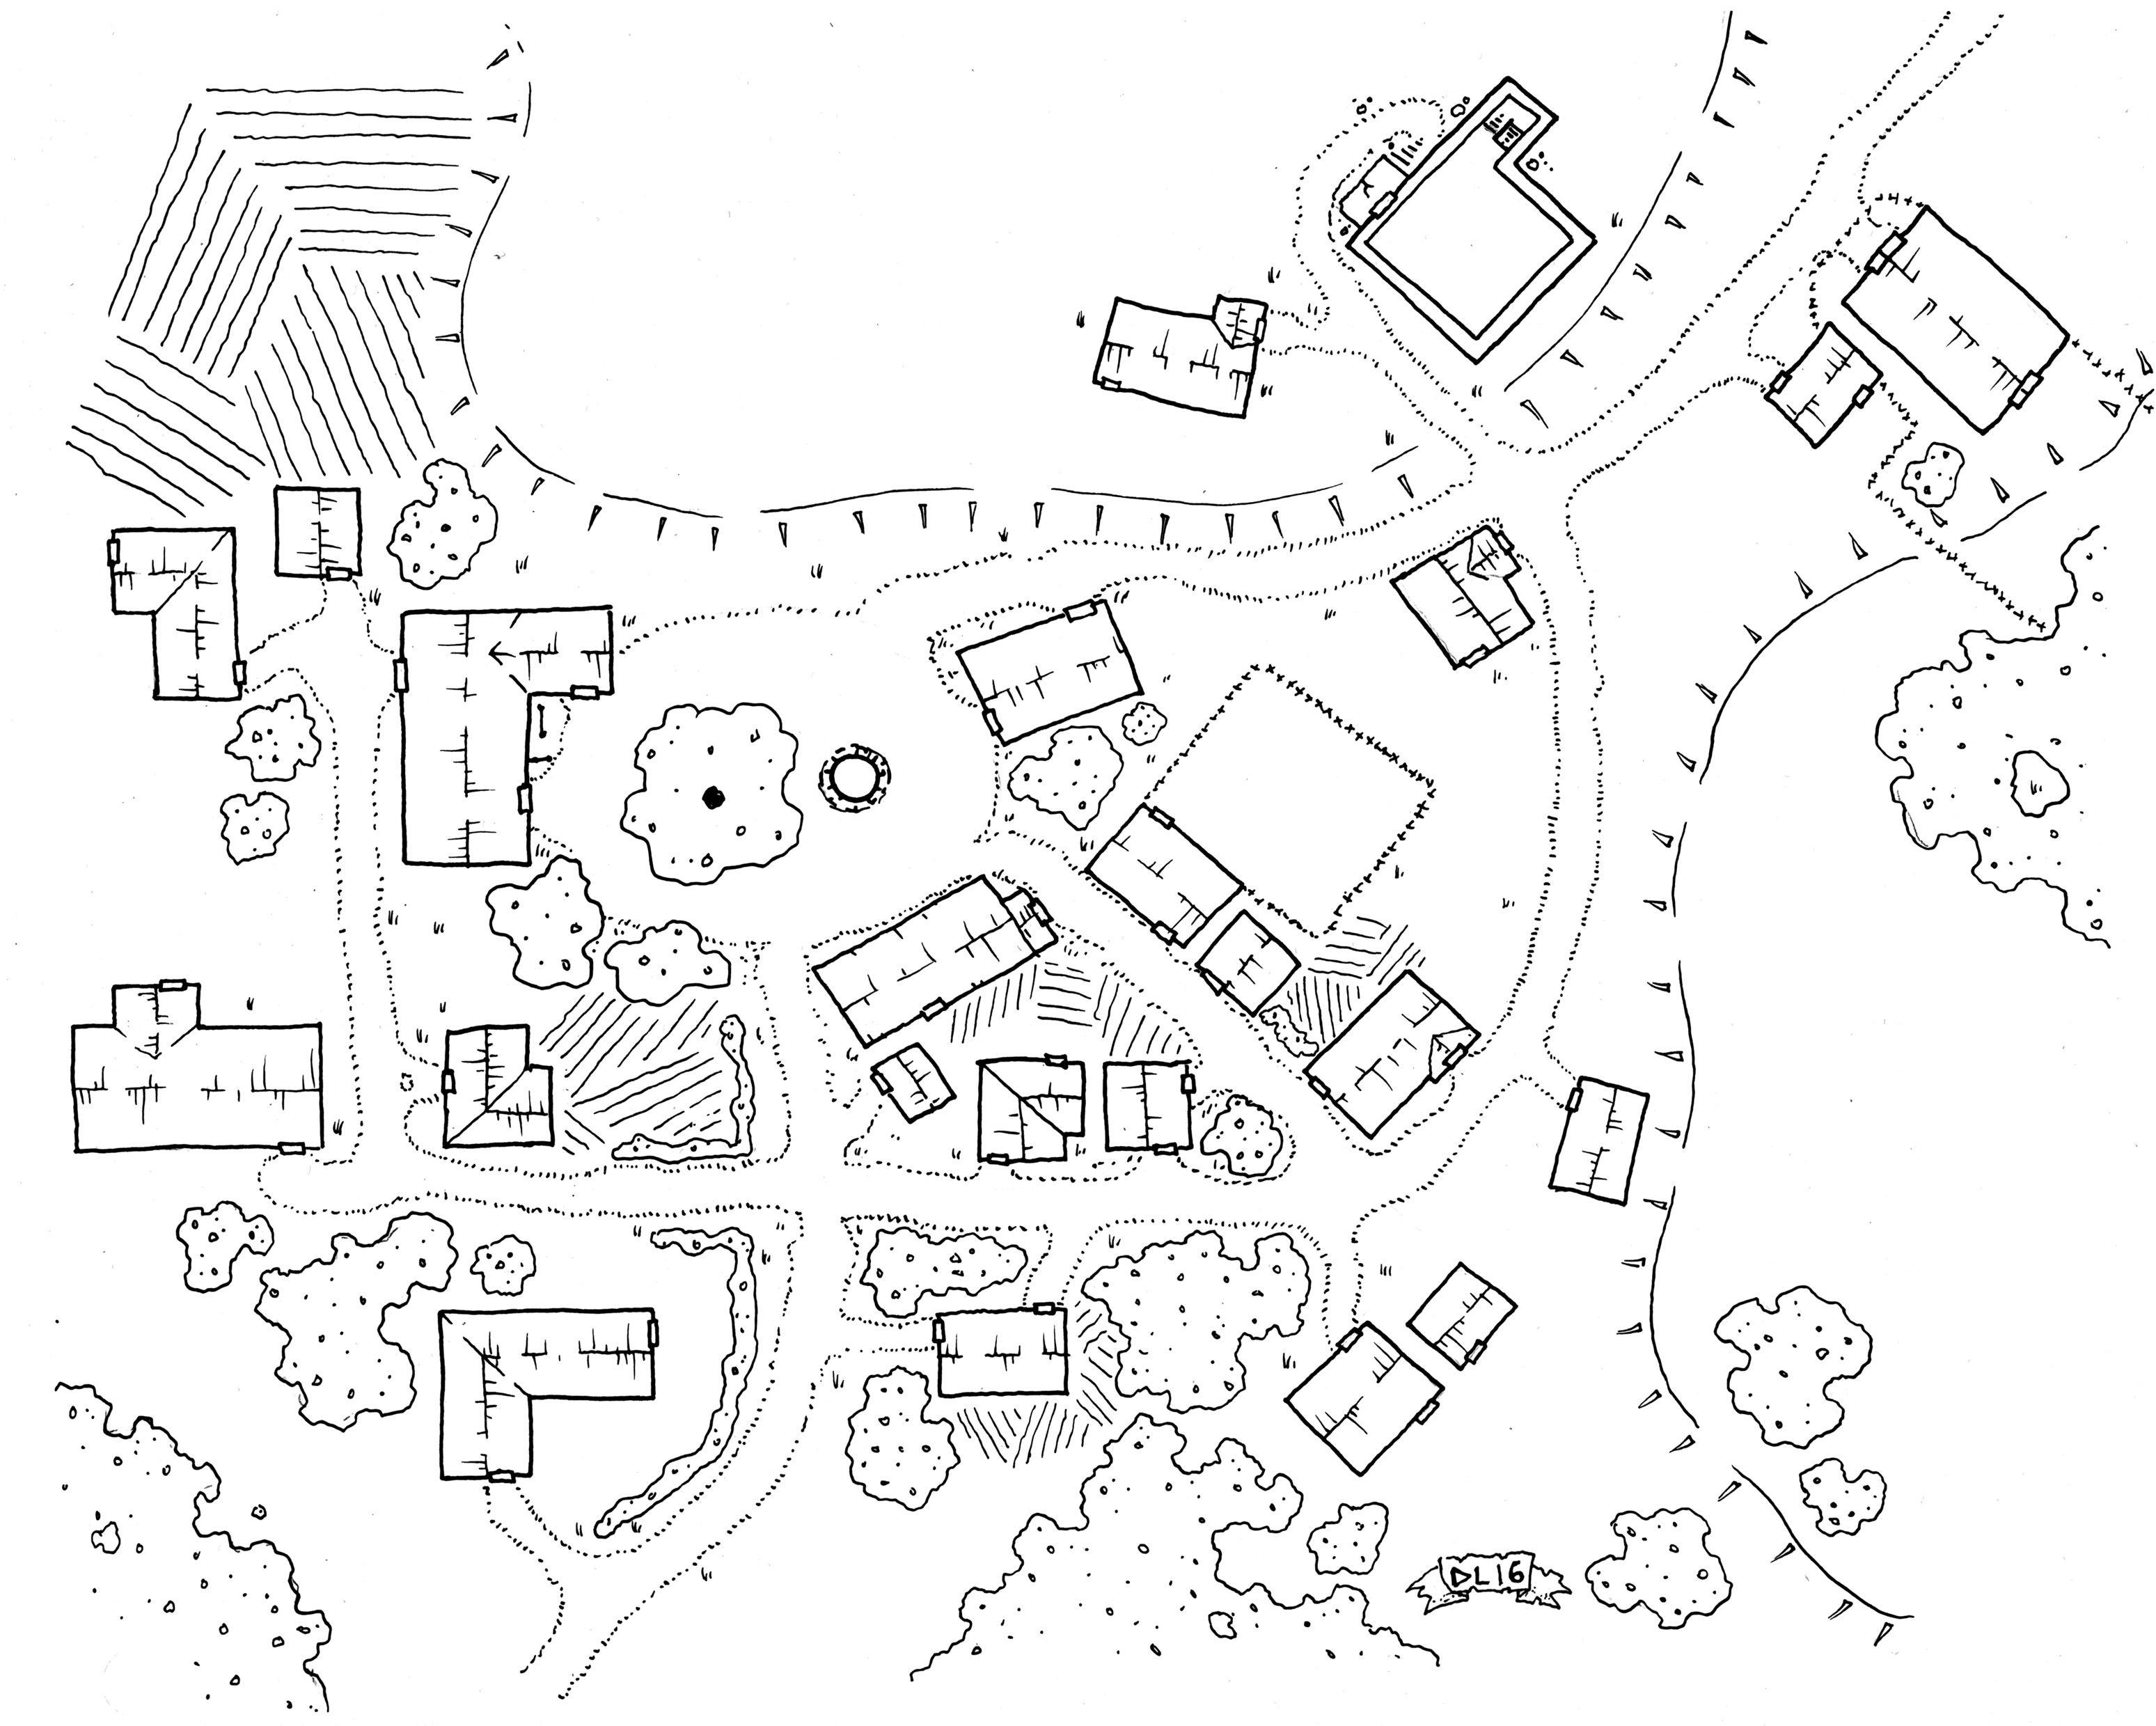 The Village Of Kith